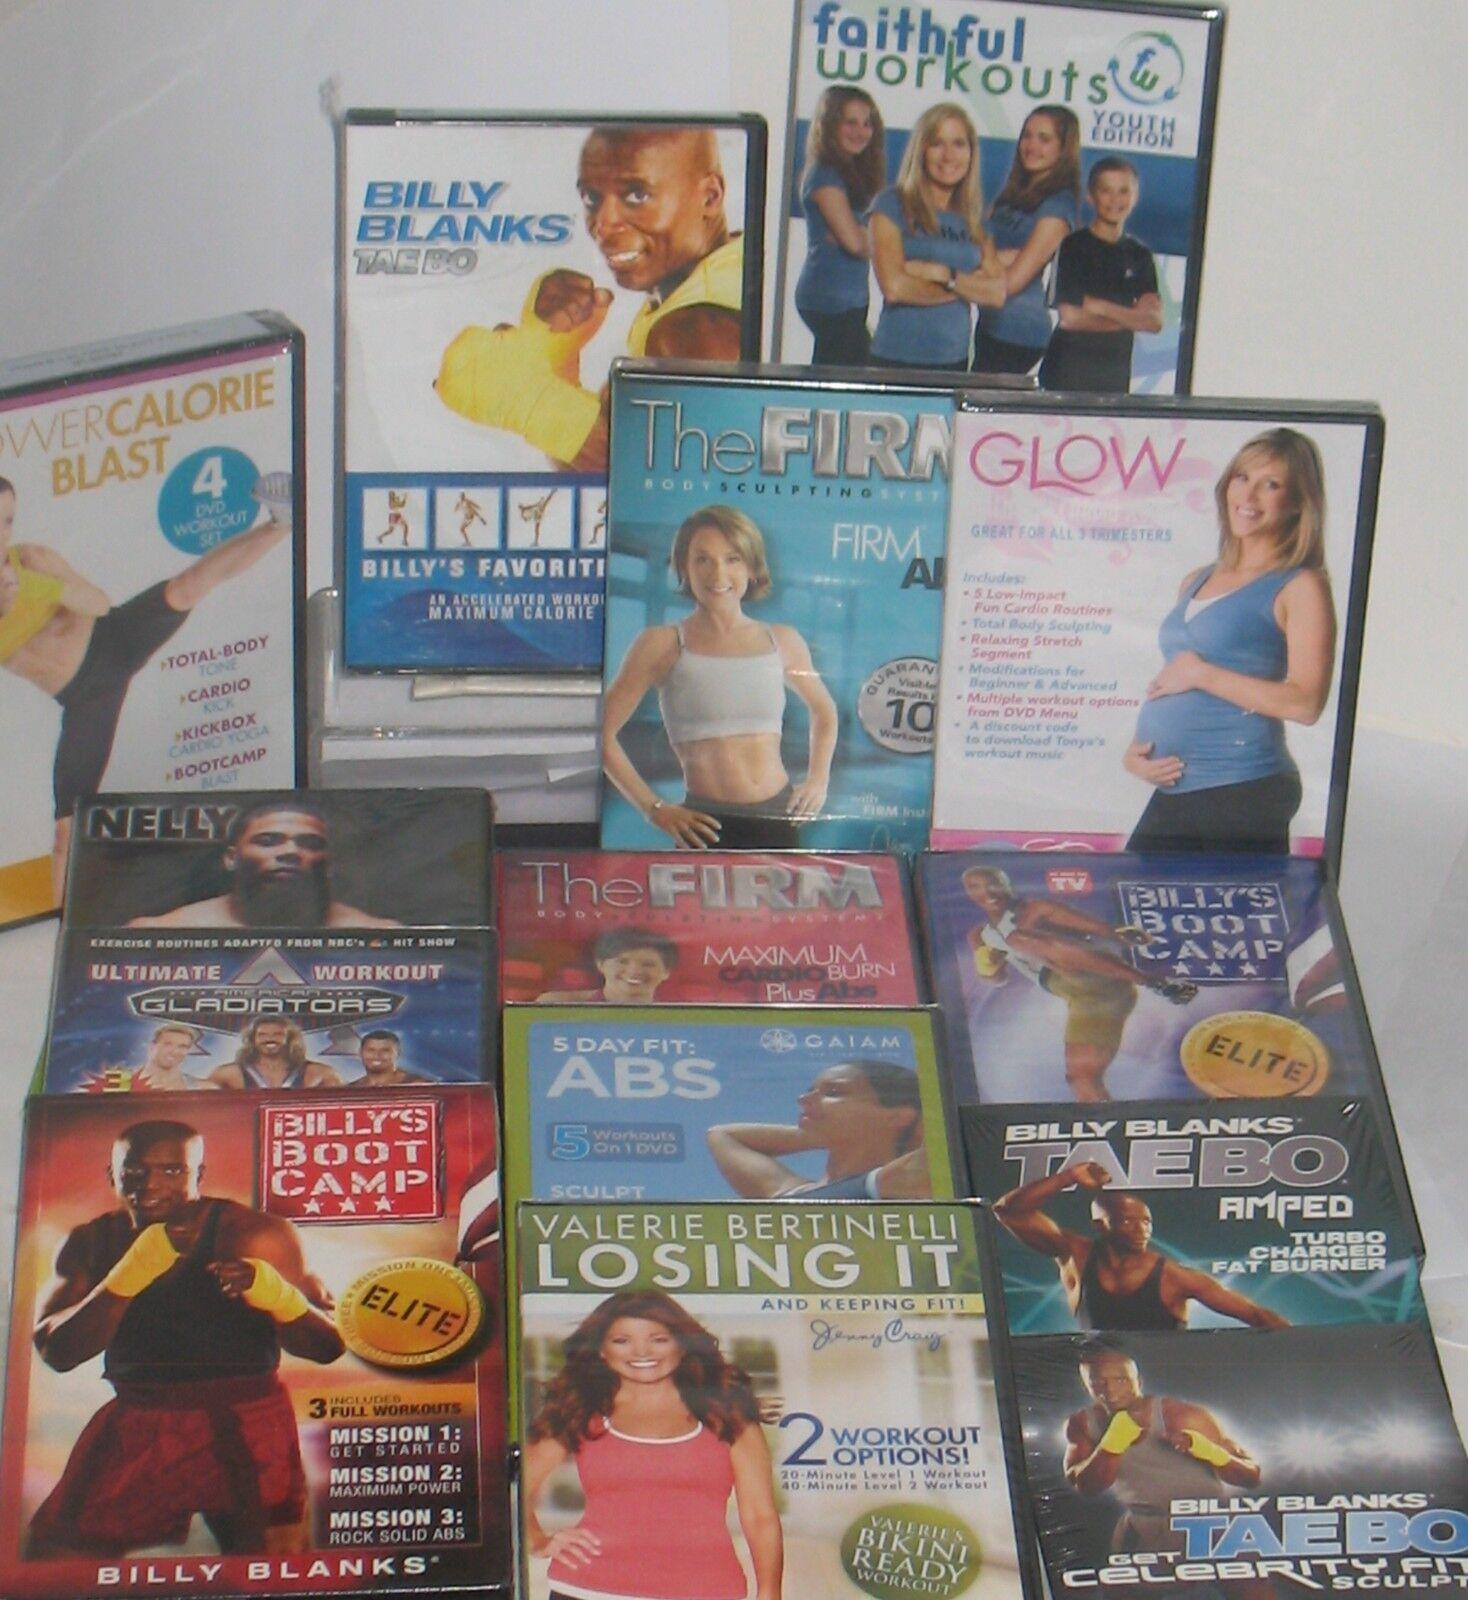 SMILEUSAVEMORE DVDS /CDS / BOOKS